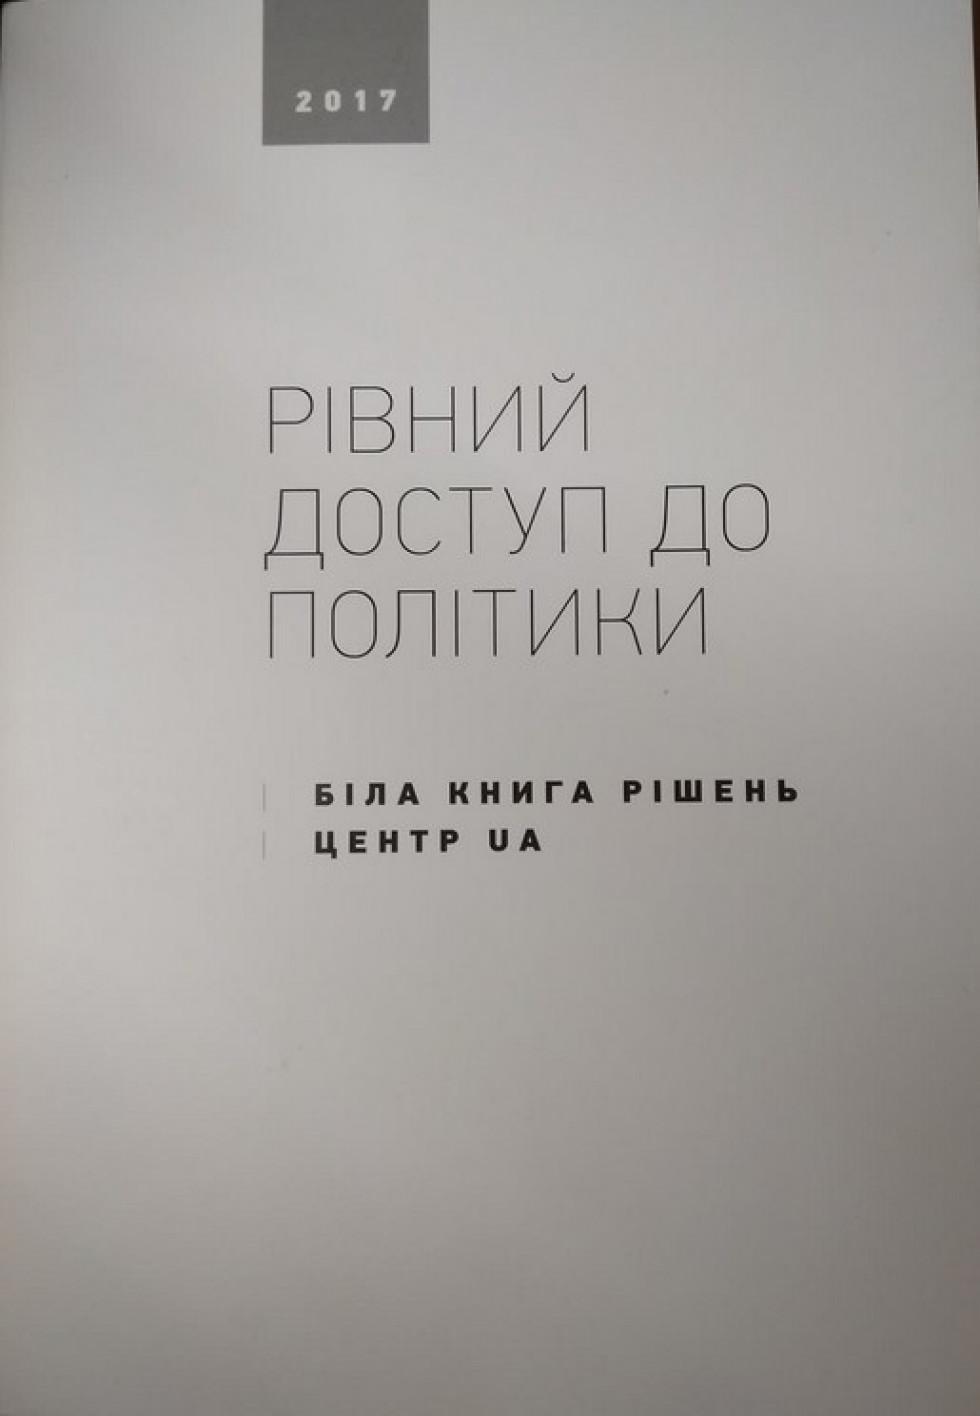 Біла книга рішень